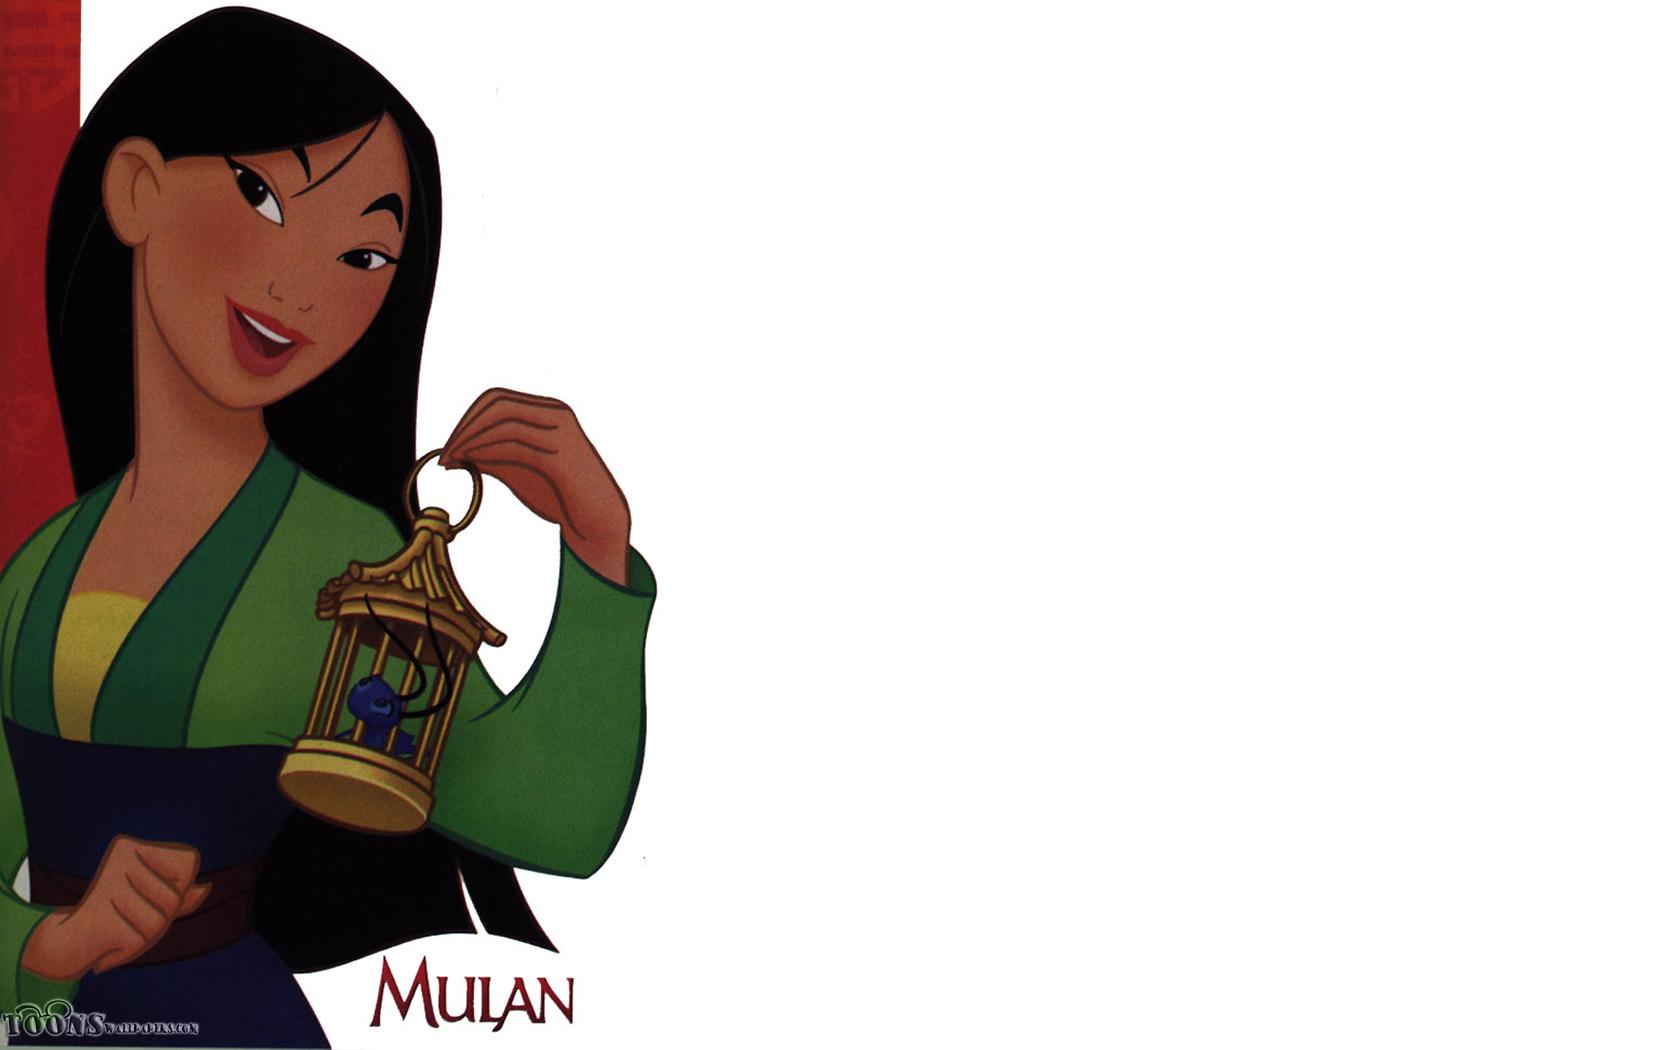 Free Download Movie Mulan Wallpaper 1680x1050 For Your Desktop Mobile Tablet Explore 78 Mulan Wallpaper Mulan Background Mulan Wallpaper Mulan Wallpapers